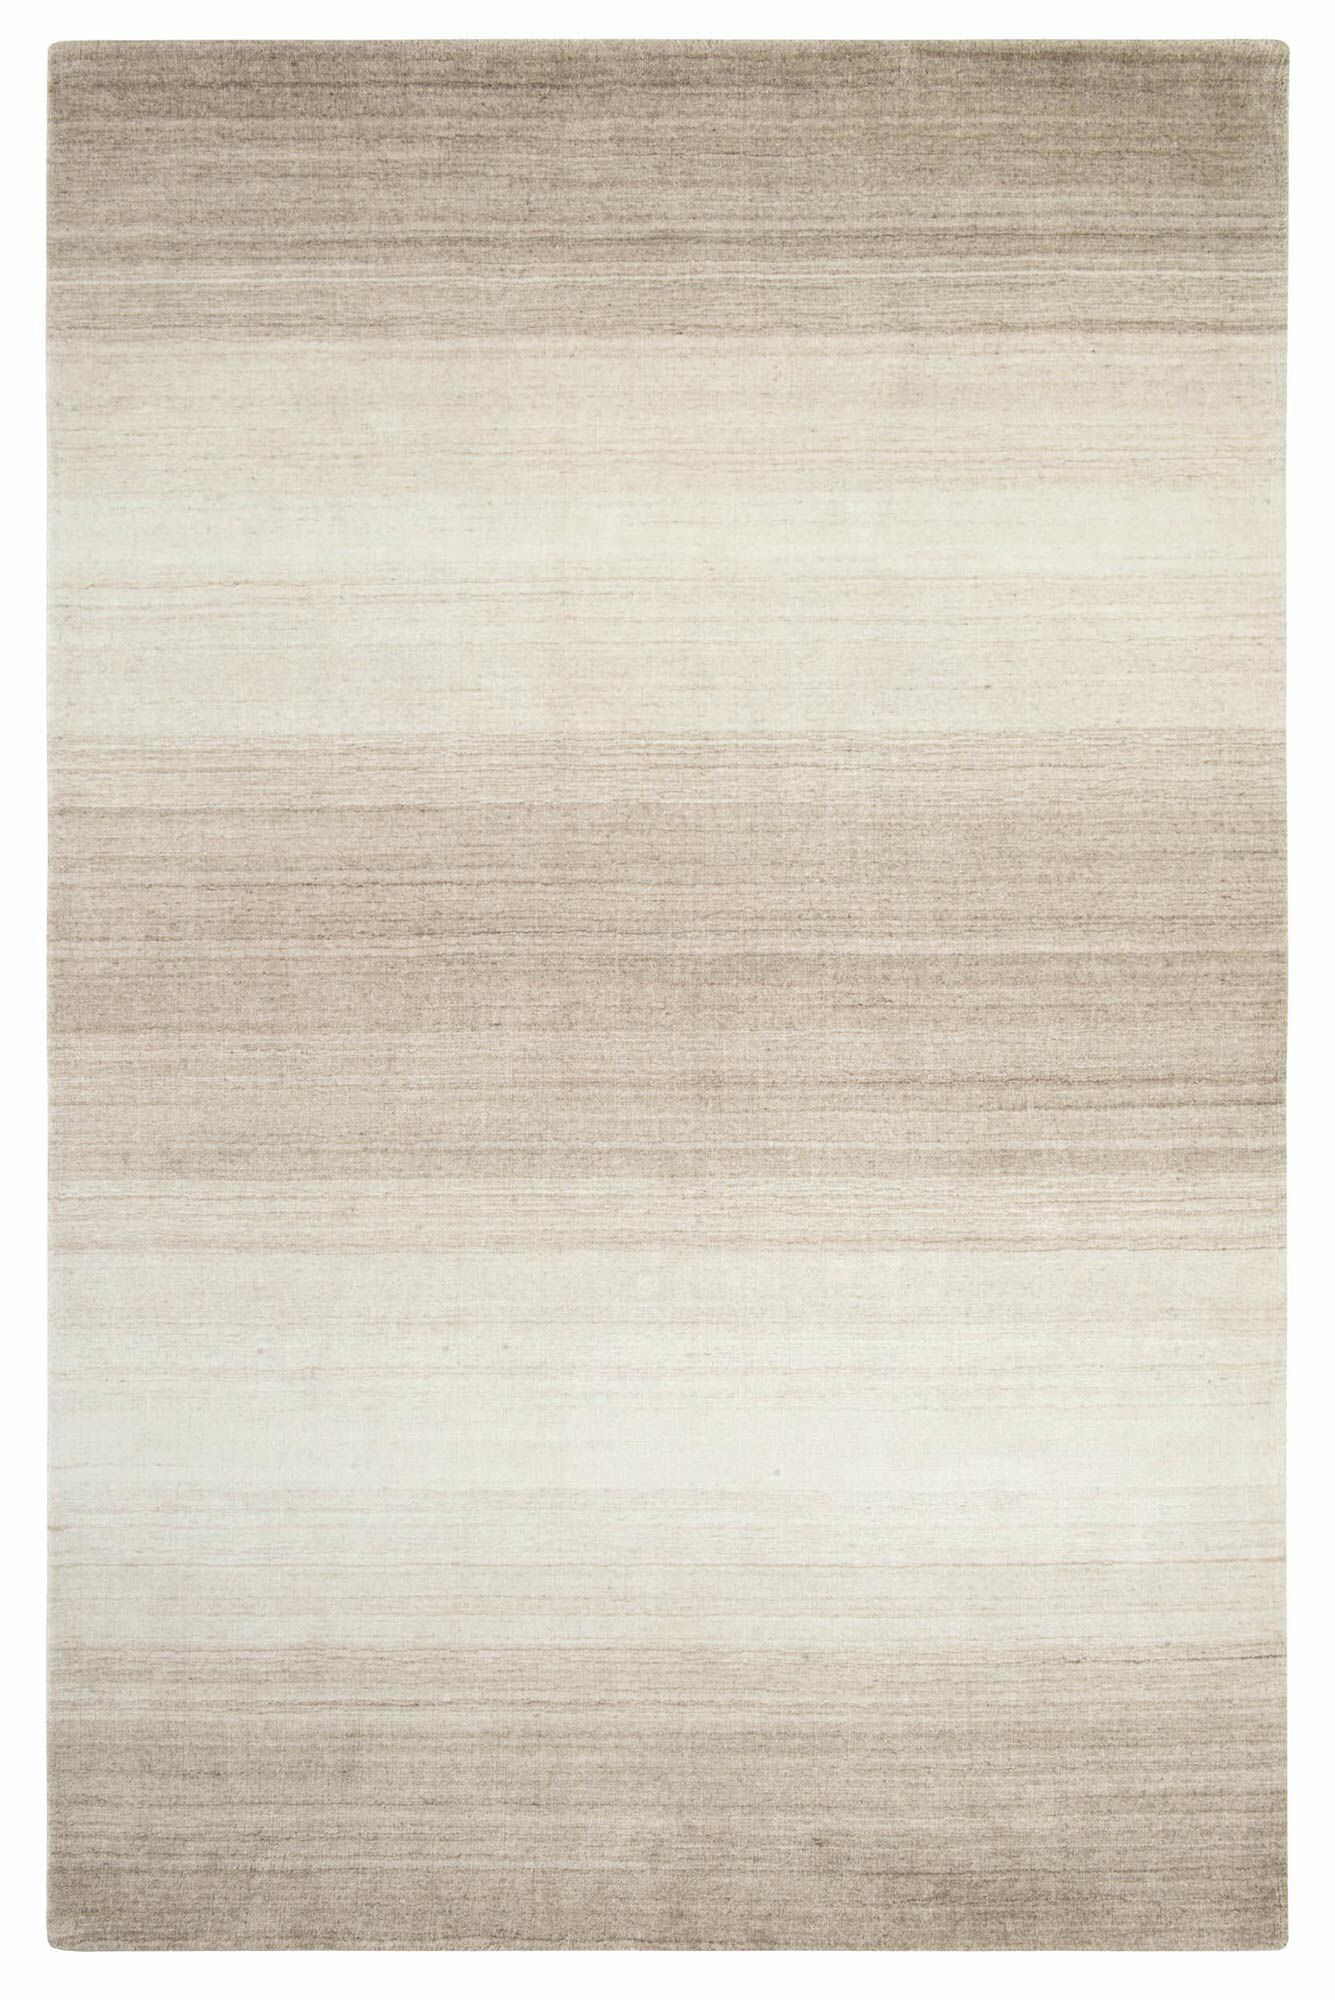 Shadow Hand-Woven Driftwood Area Rug Rug Size: 5' x 8'